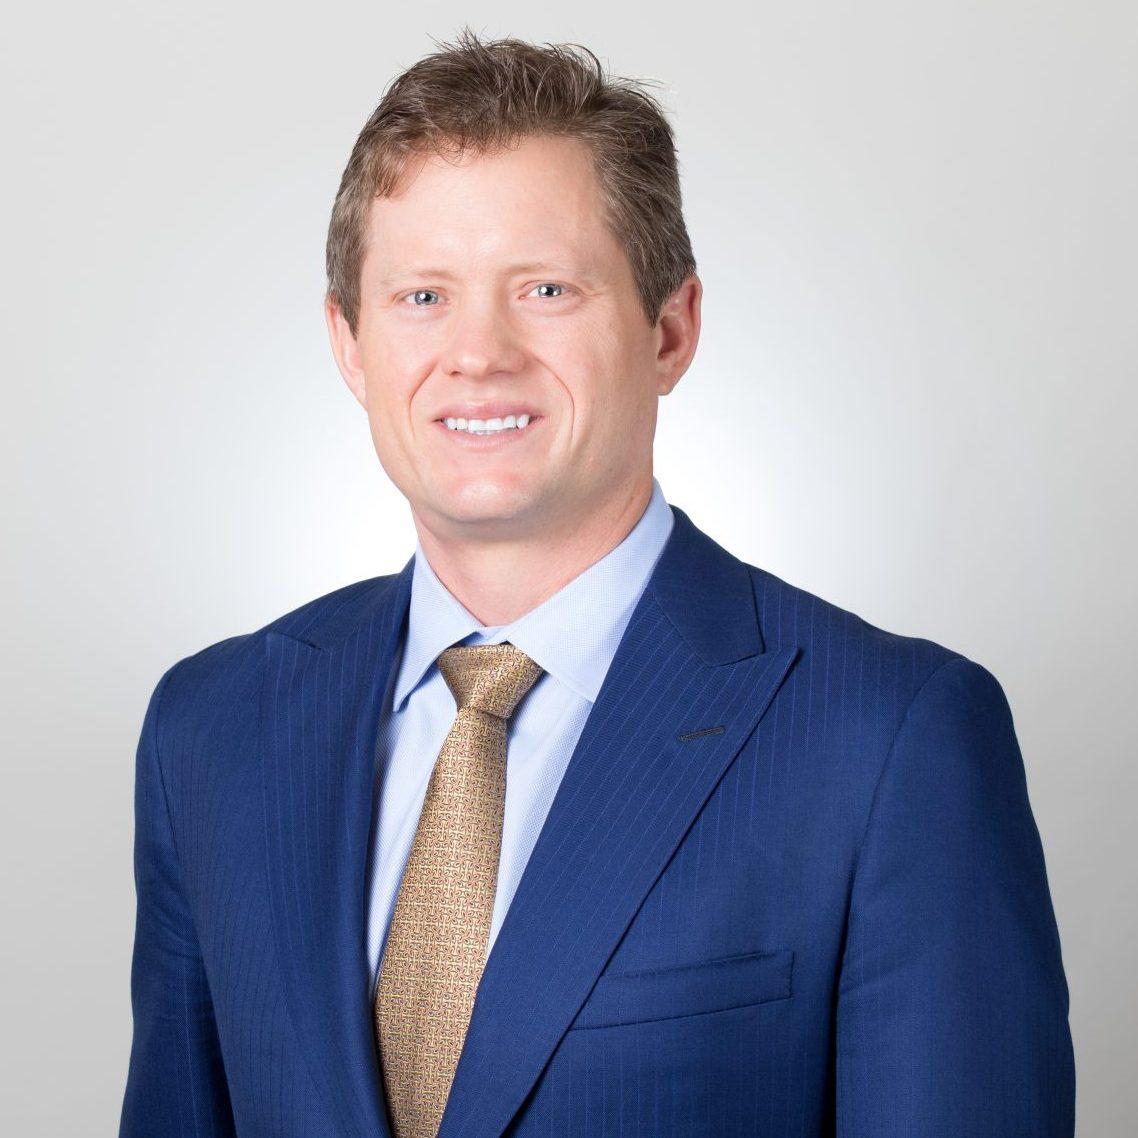 Dan Lesniak - real estate niches